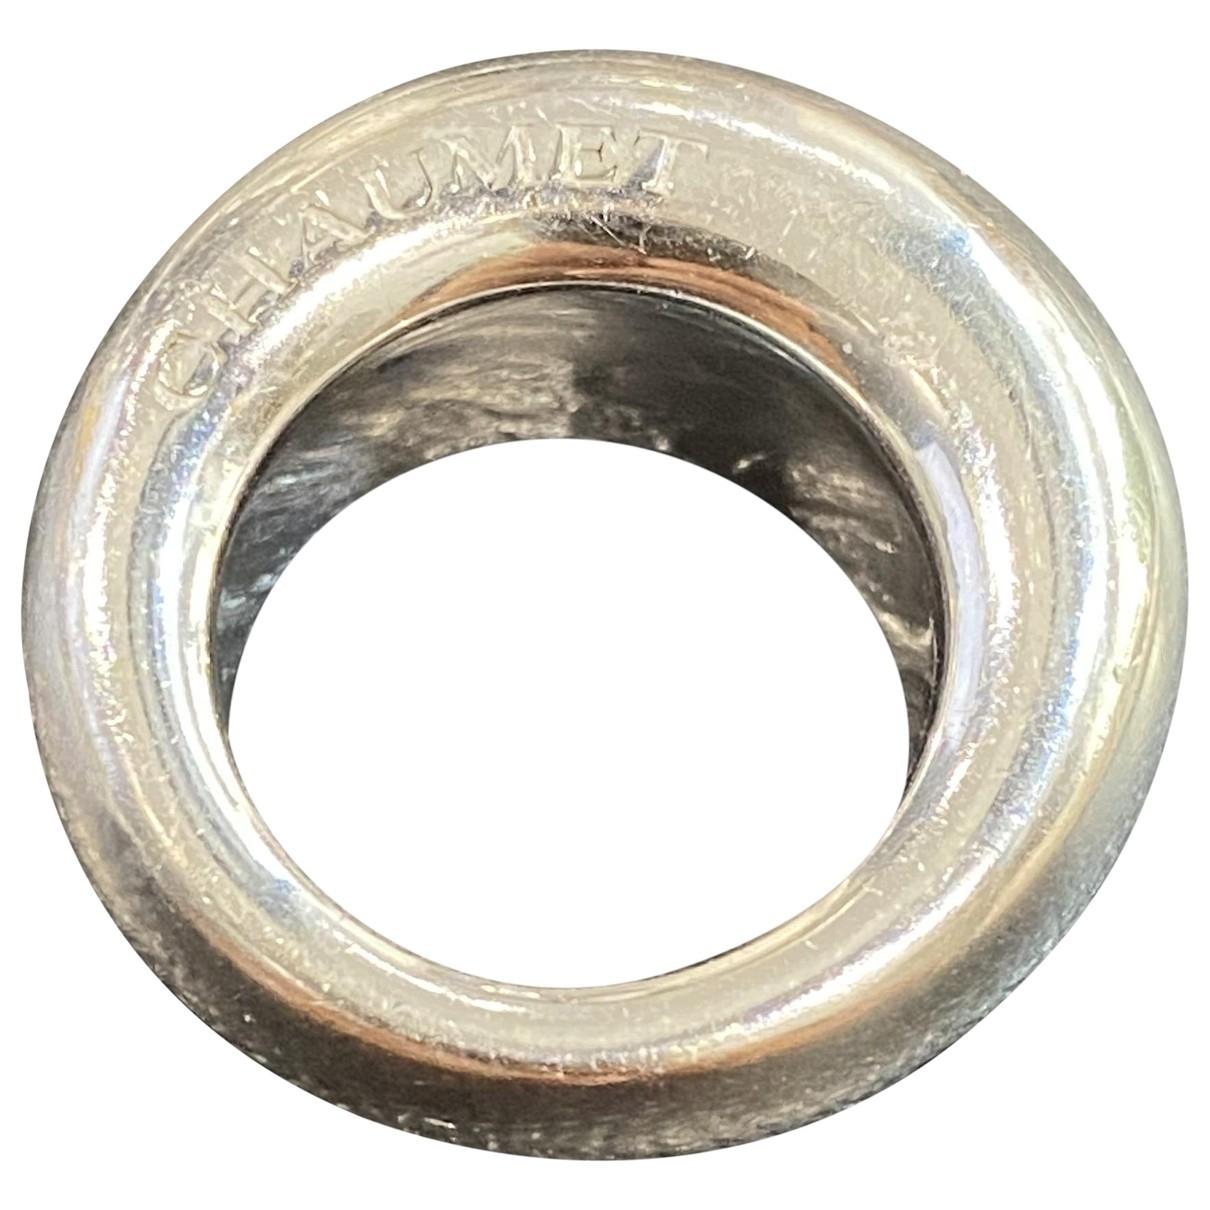 Chaumet Anneau Ring in Weissgold